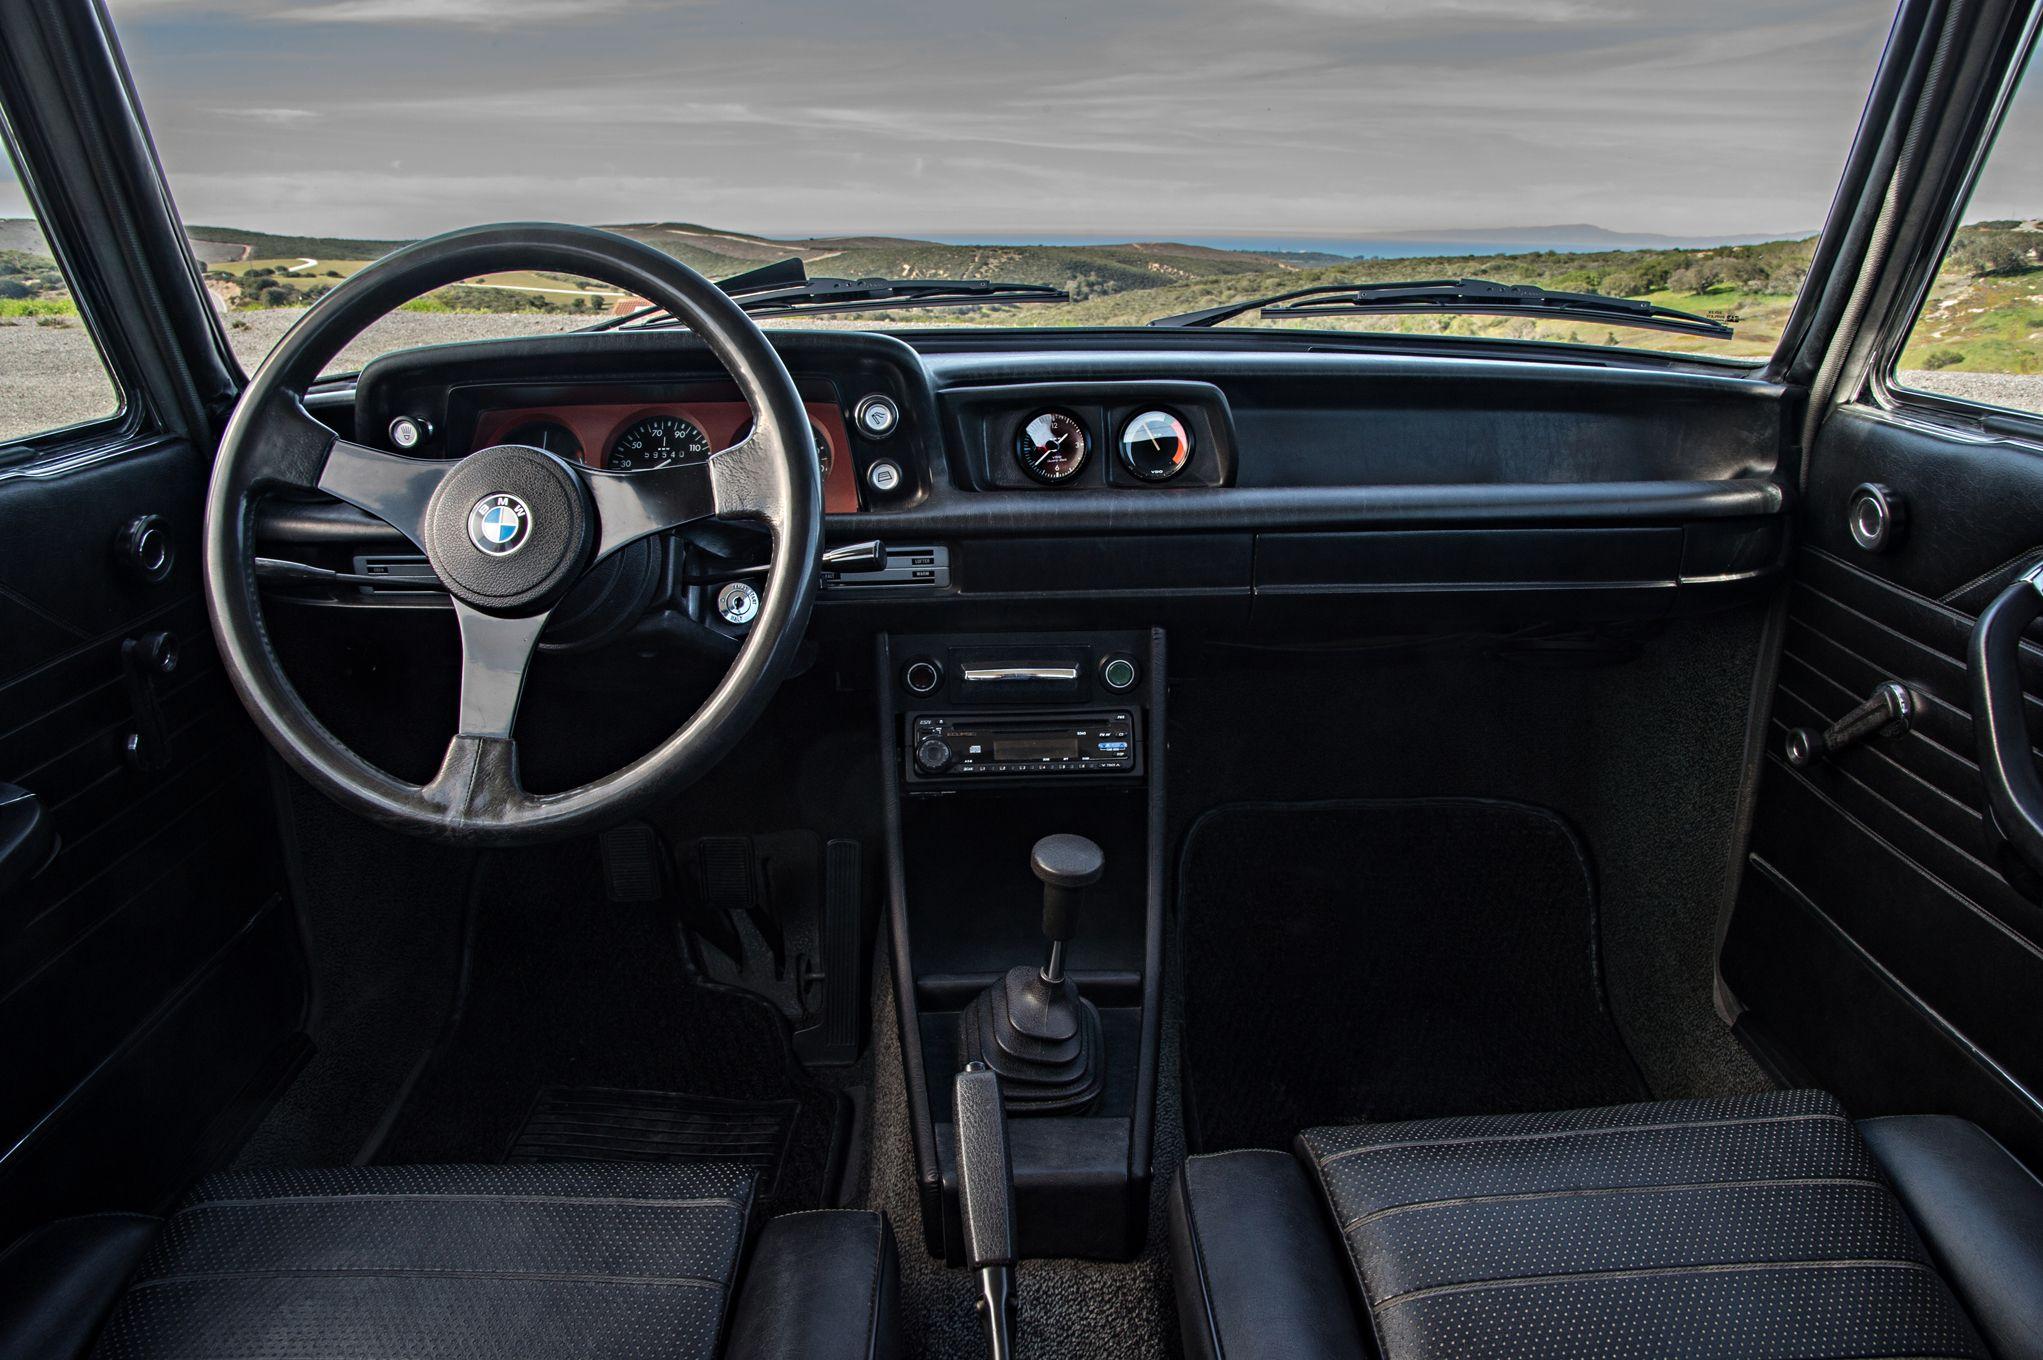 bmw-2002-turbo-interior.jpg